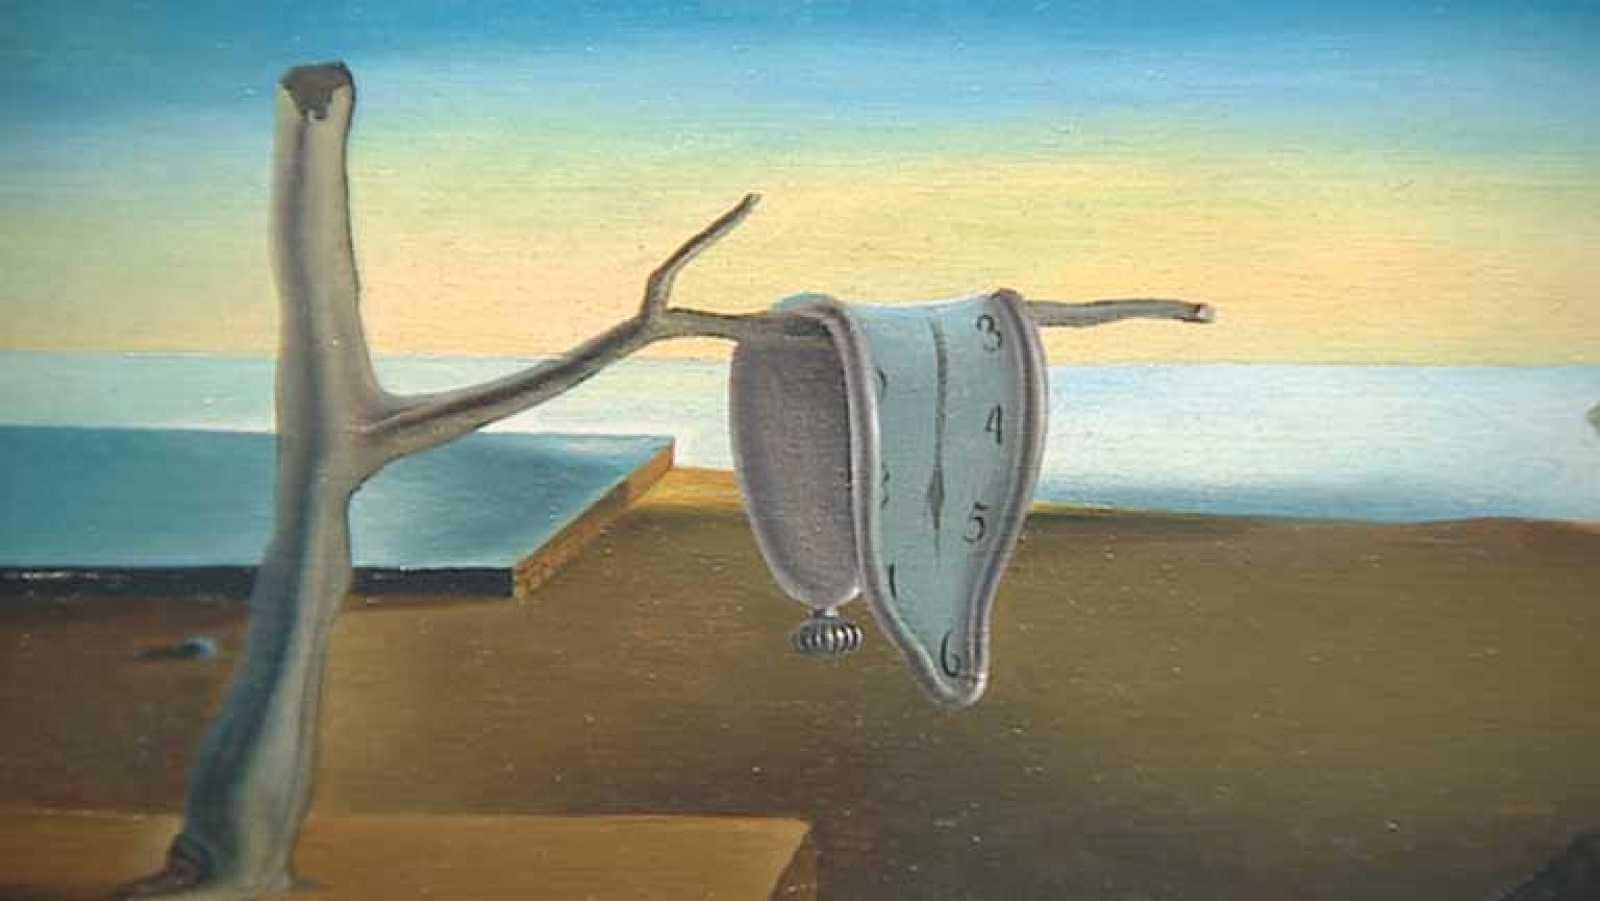 Reloj derretido obra surreal de Salvador Dali